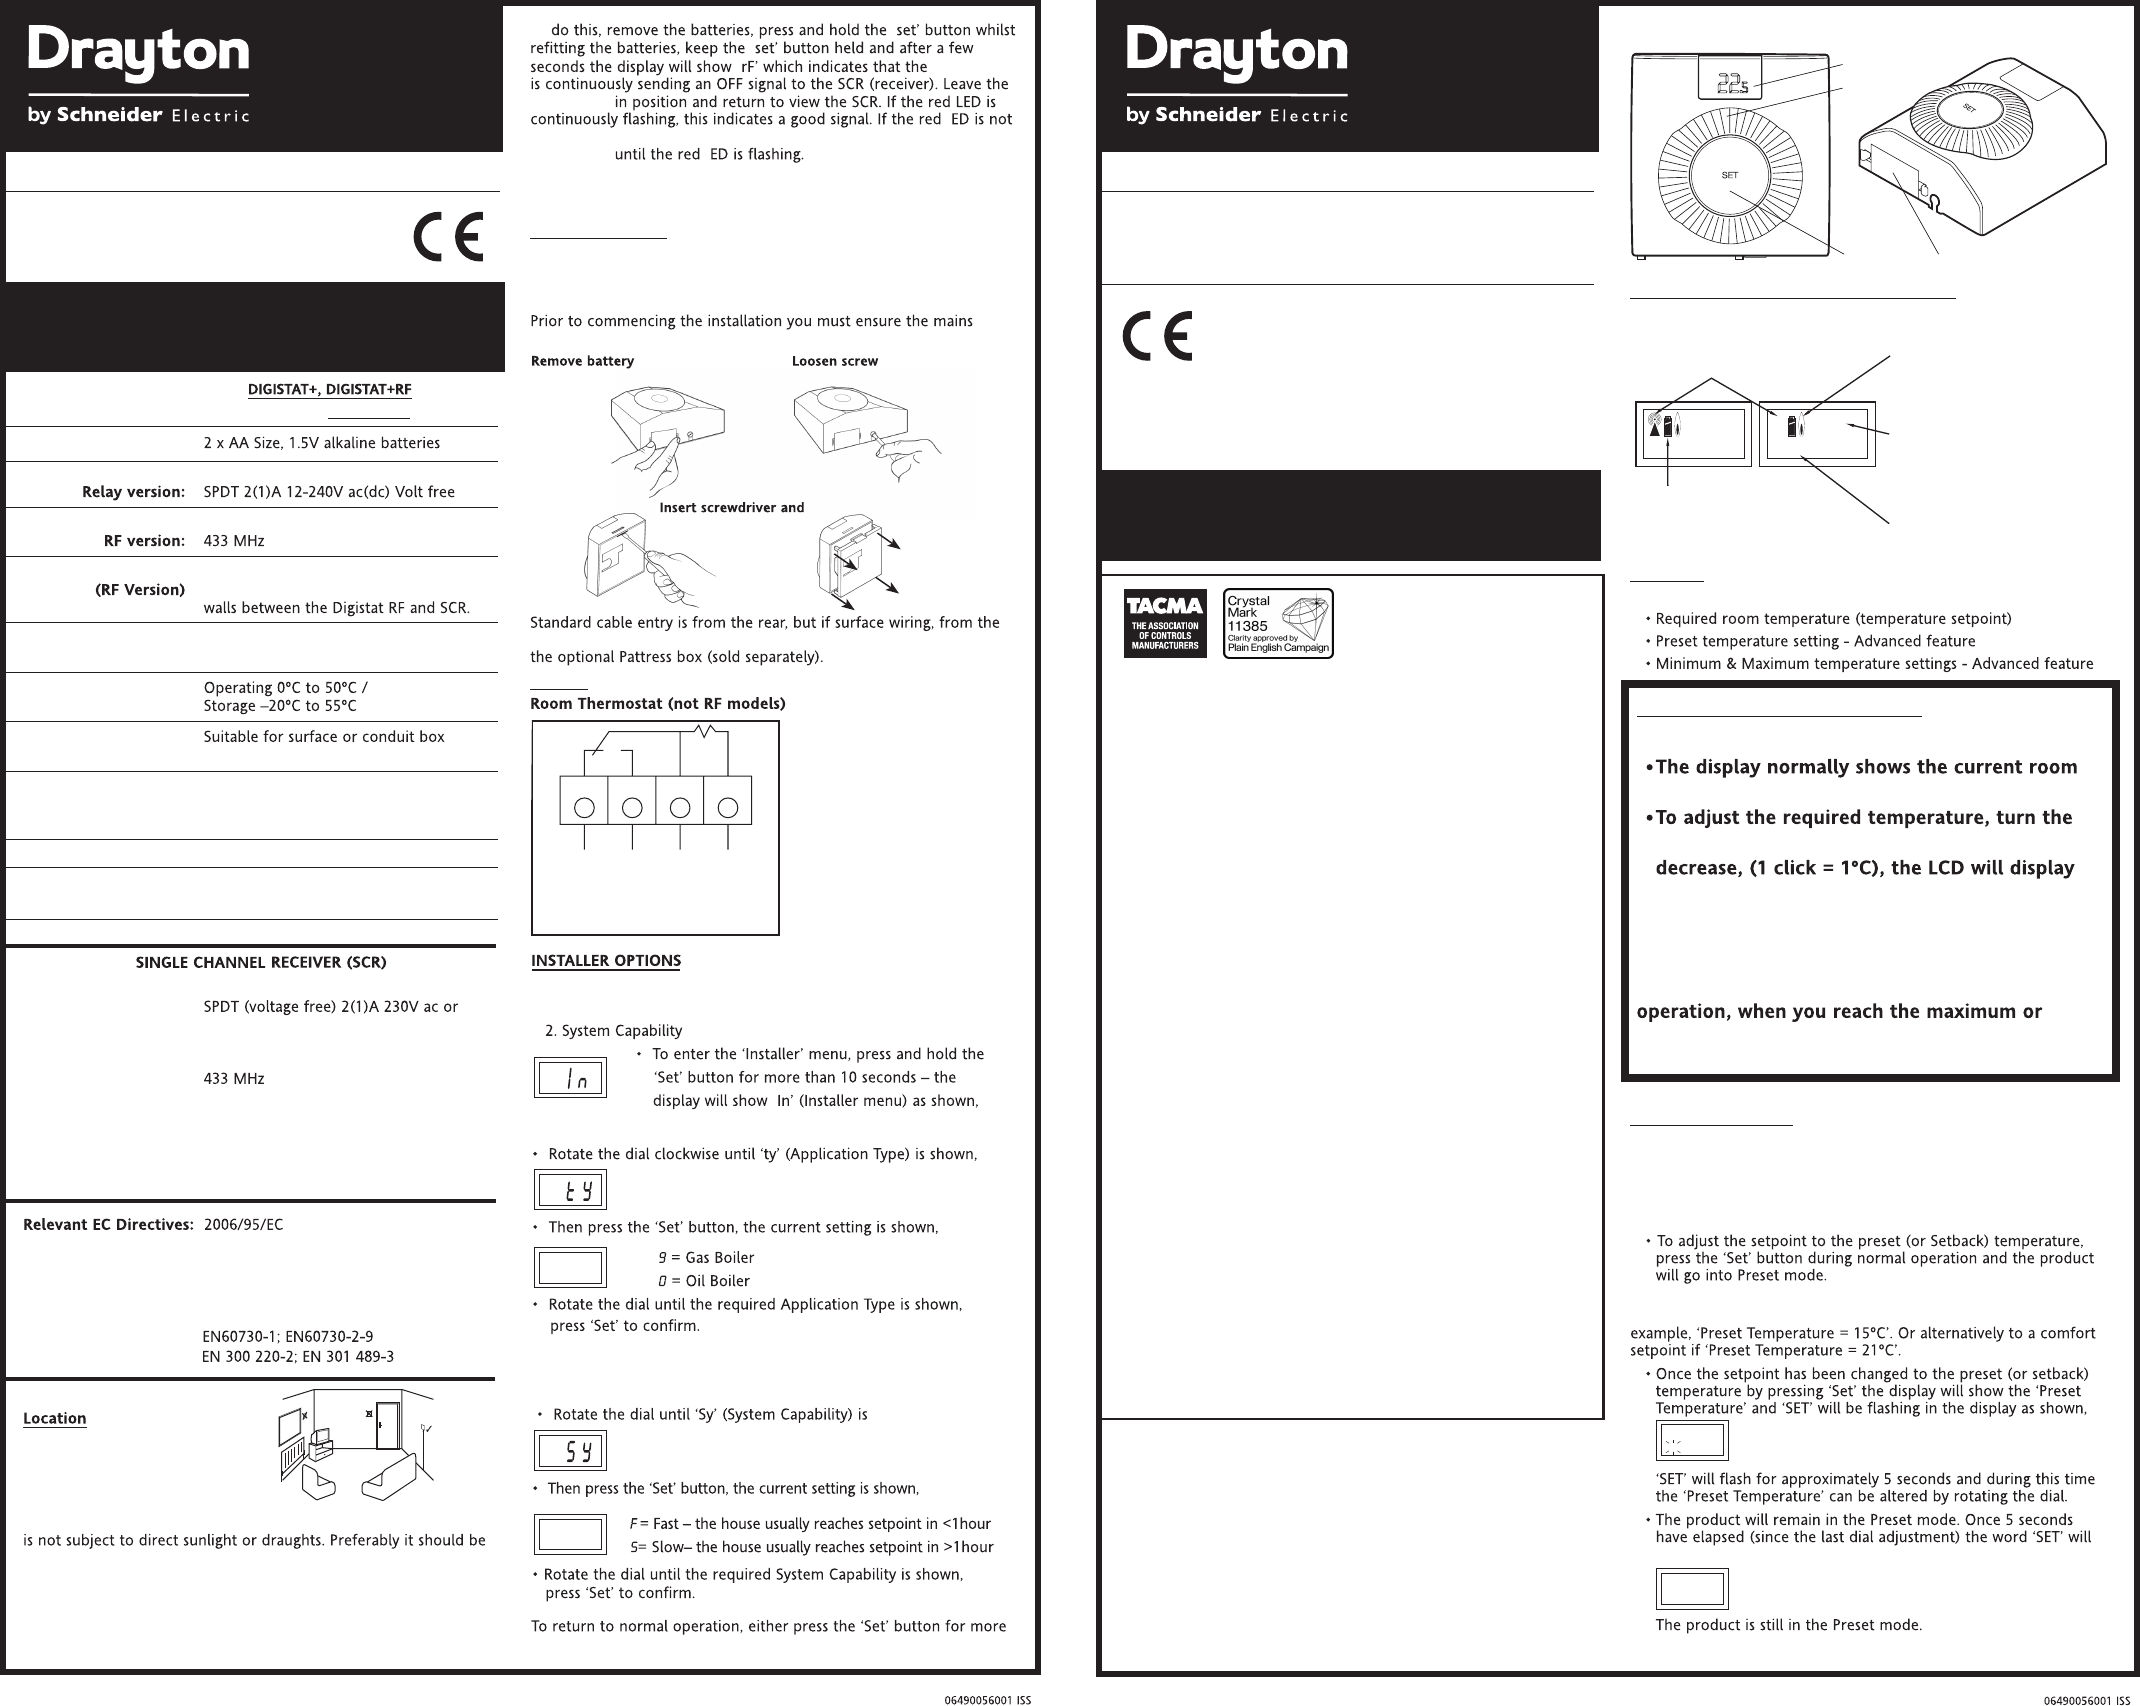 Phenomenal Handleiding Drayton Digistat Plus 30002 Rf601 Pagina 2 Van 2 Wiring Cloud Hisonuggs Outletorg